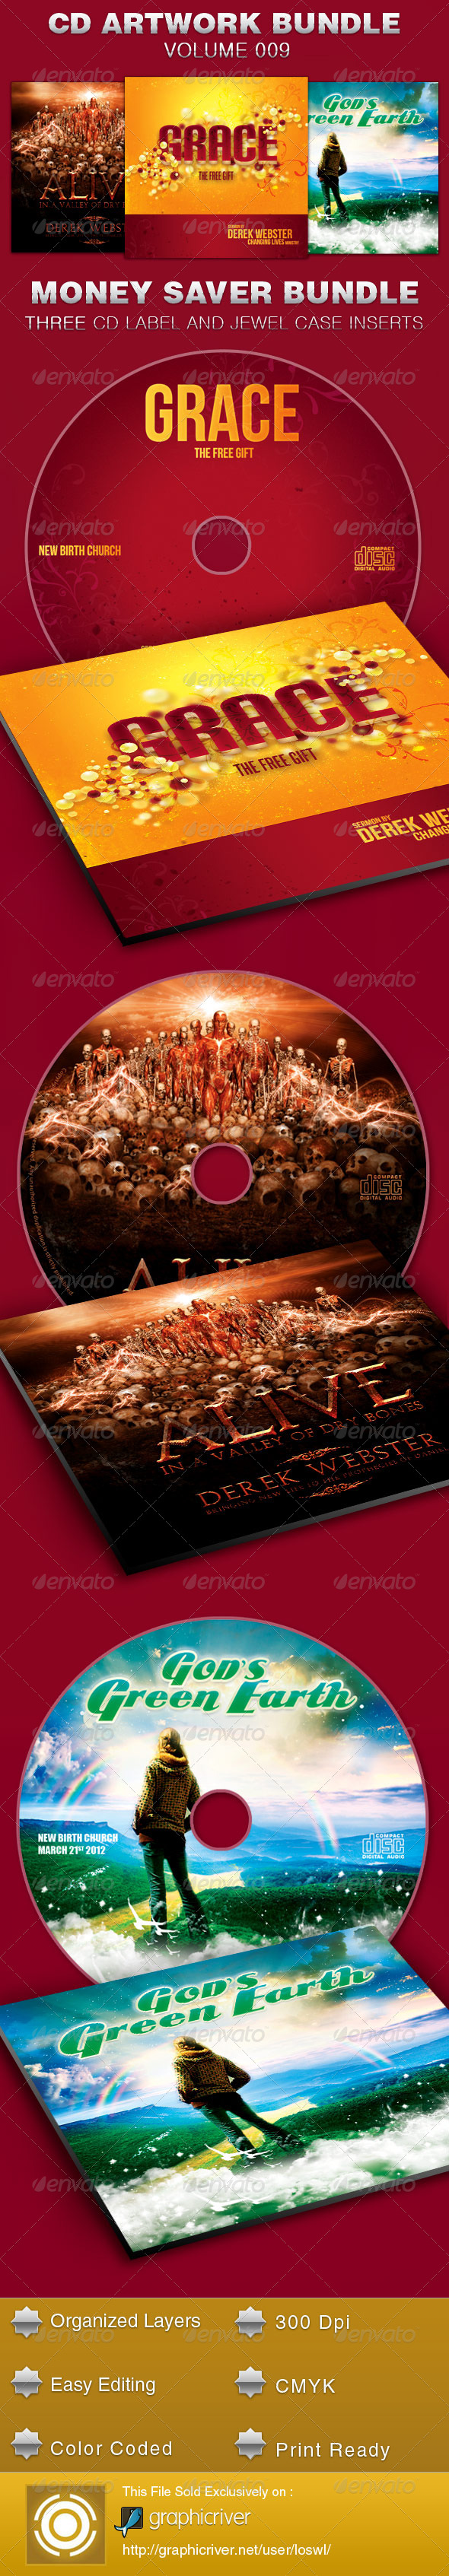 GraphicRiver CD Cover Artwork Template Bundle-Vol 009 5391694